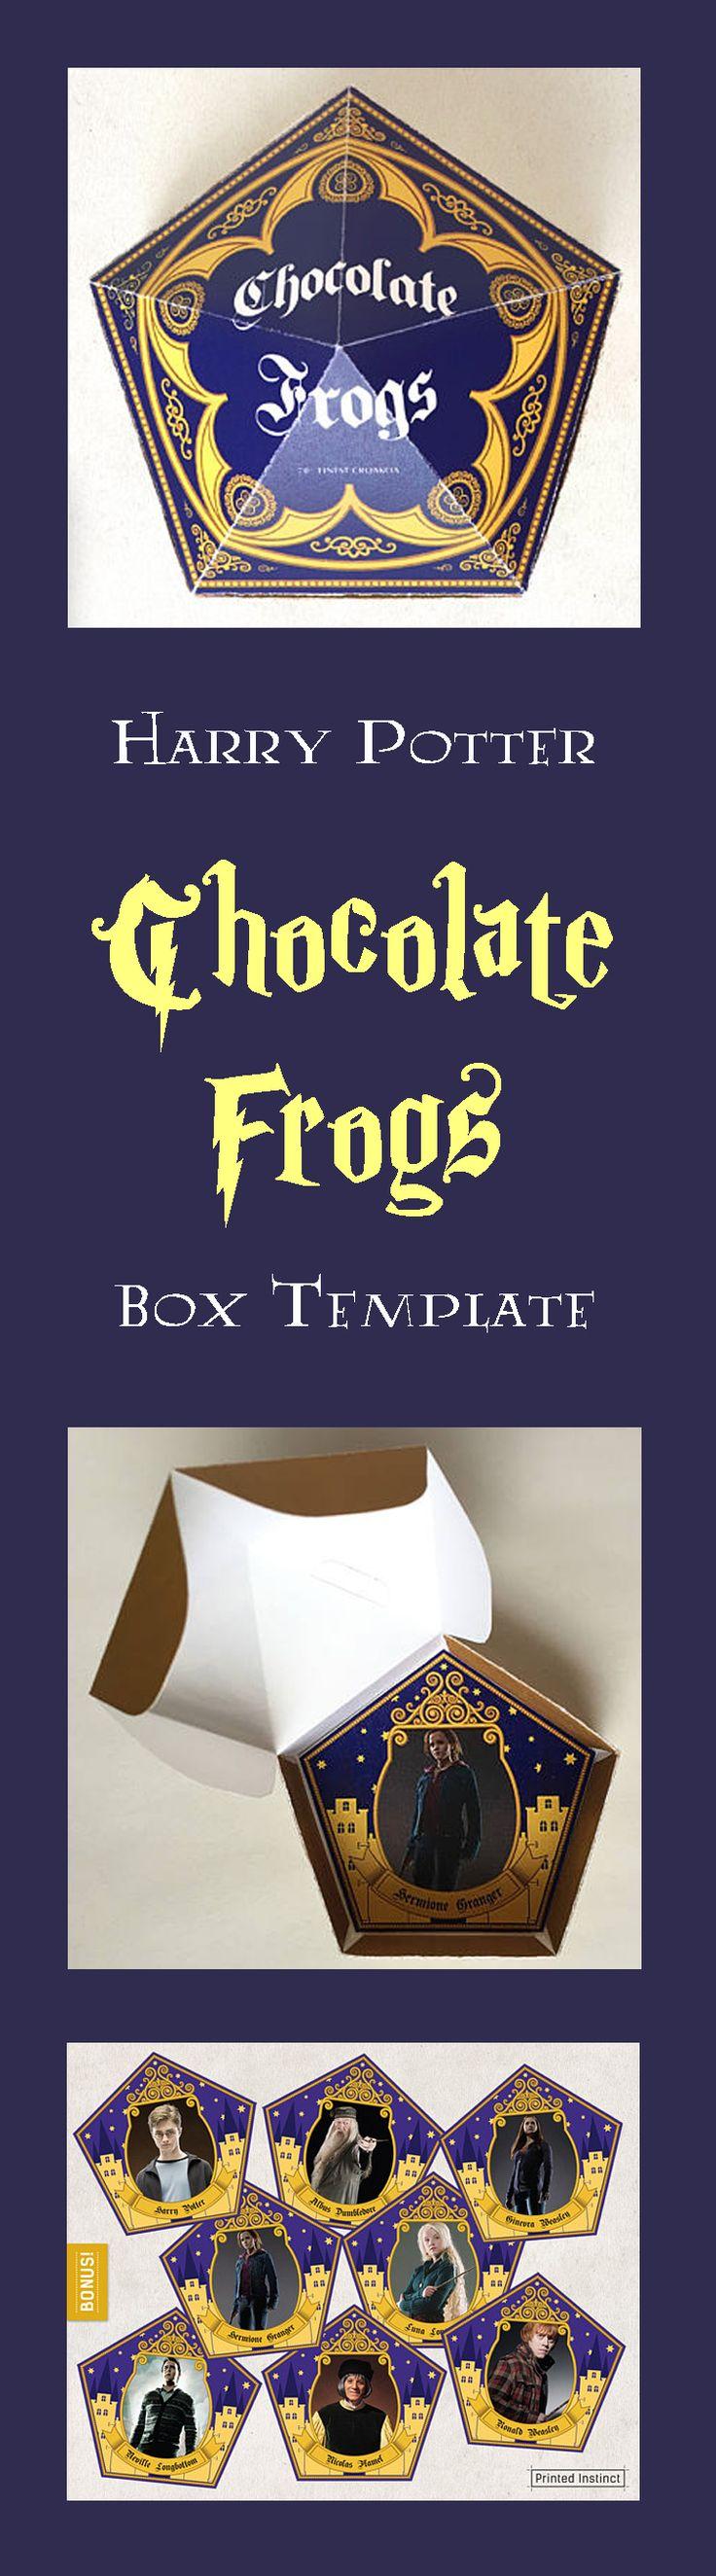 Chocolat frog Harry Potter